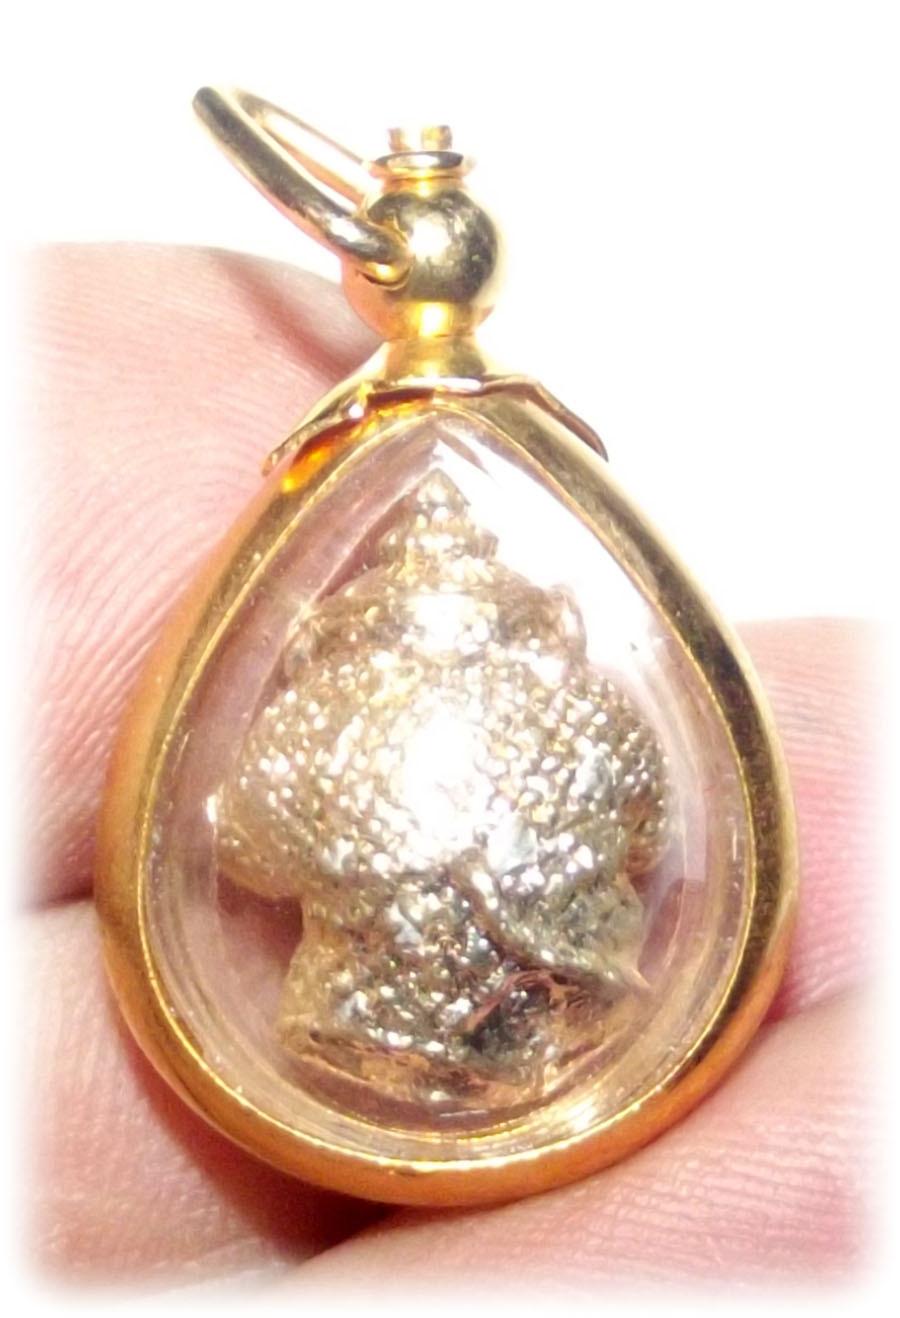 Pra Rahu Galai Ngern olden style silver-leaden alloy